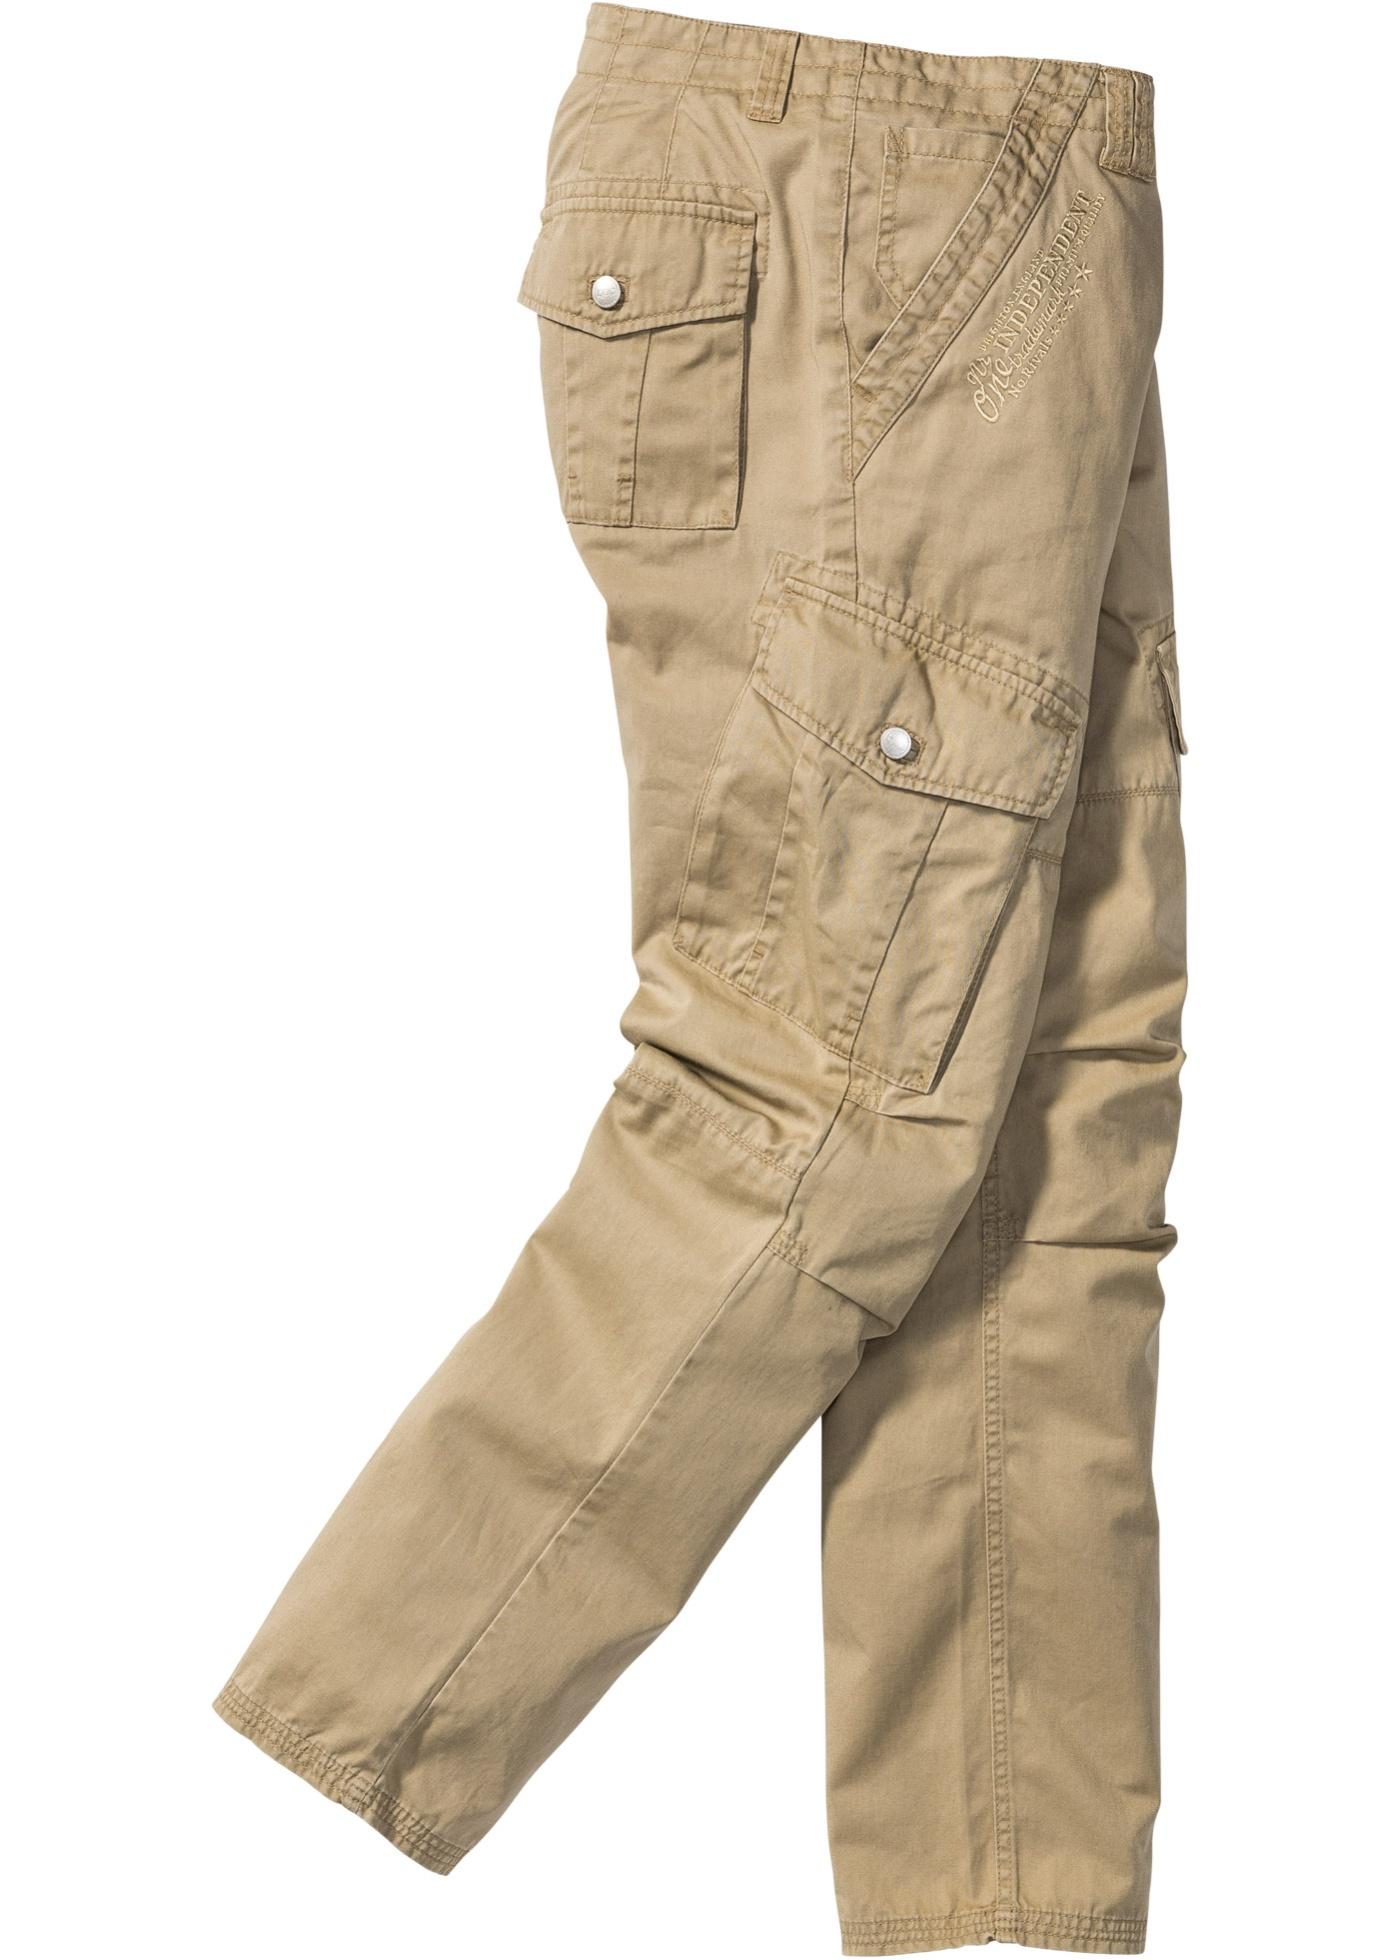 Kargo kalhoty Regular Fit - Béžová